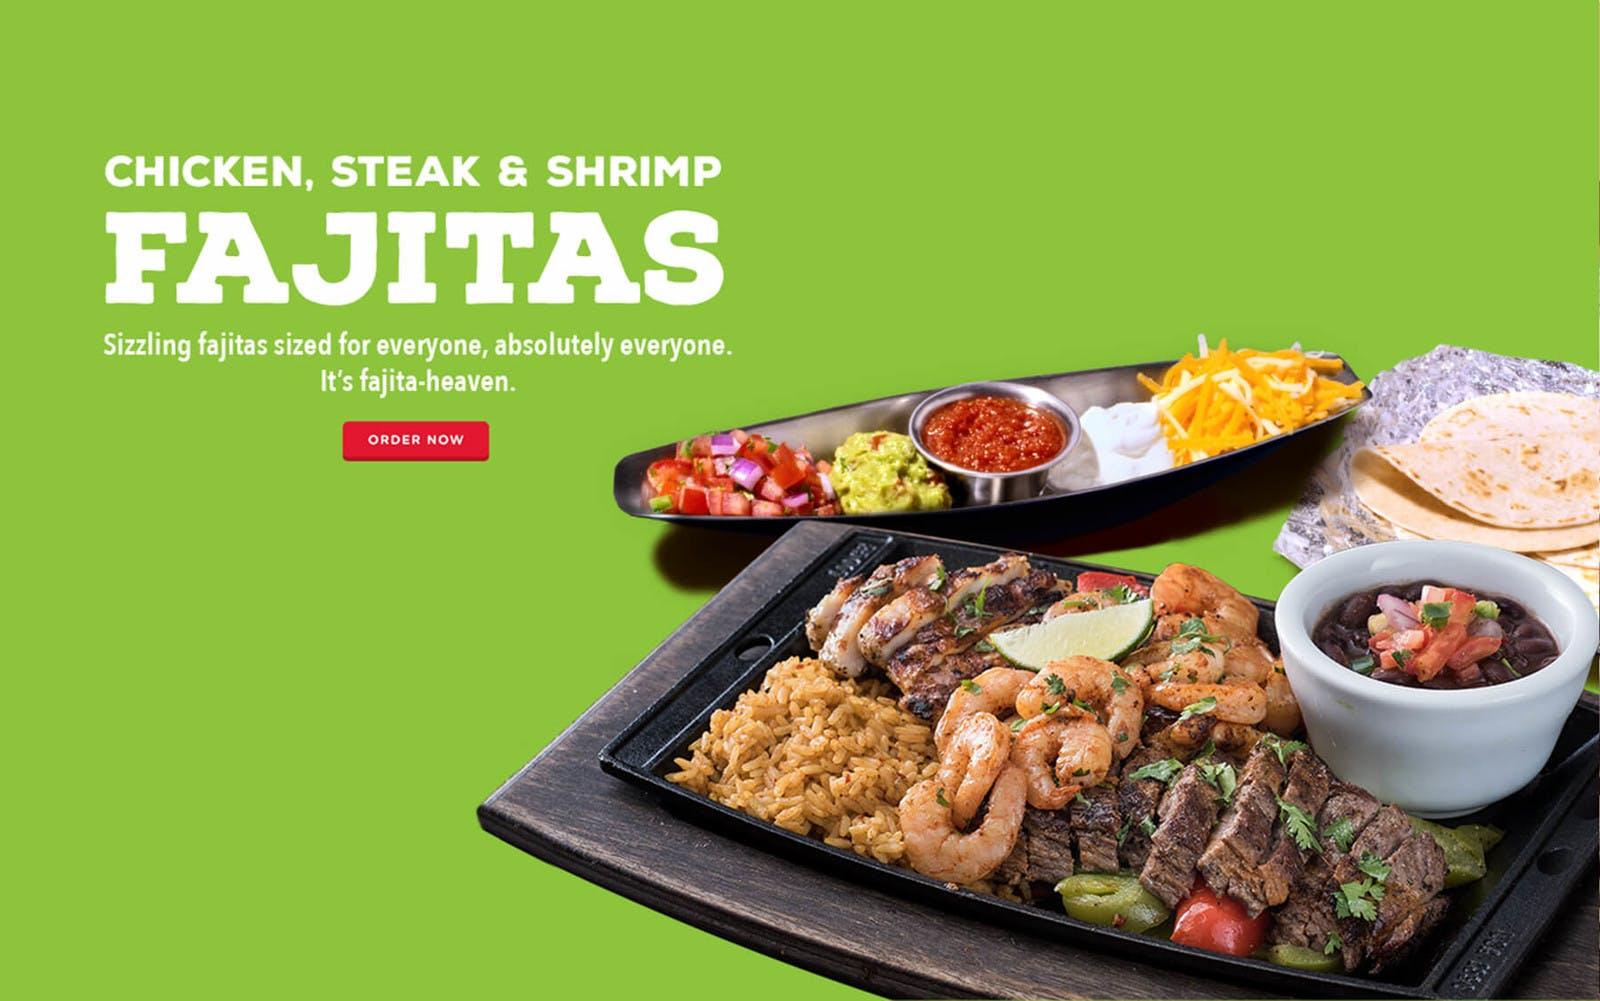 Chicken, Steak & Shrimp Fajitas - Sizzling fajitas for everyone at Chili's. It's fajita-heaven!.